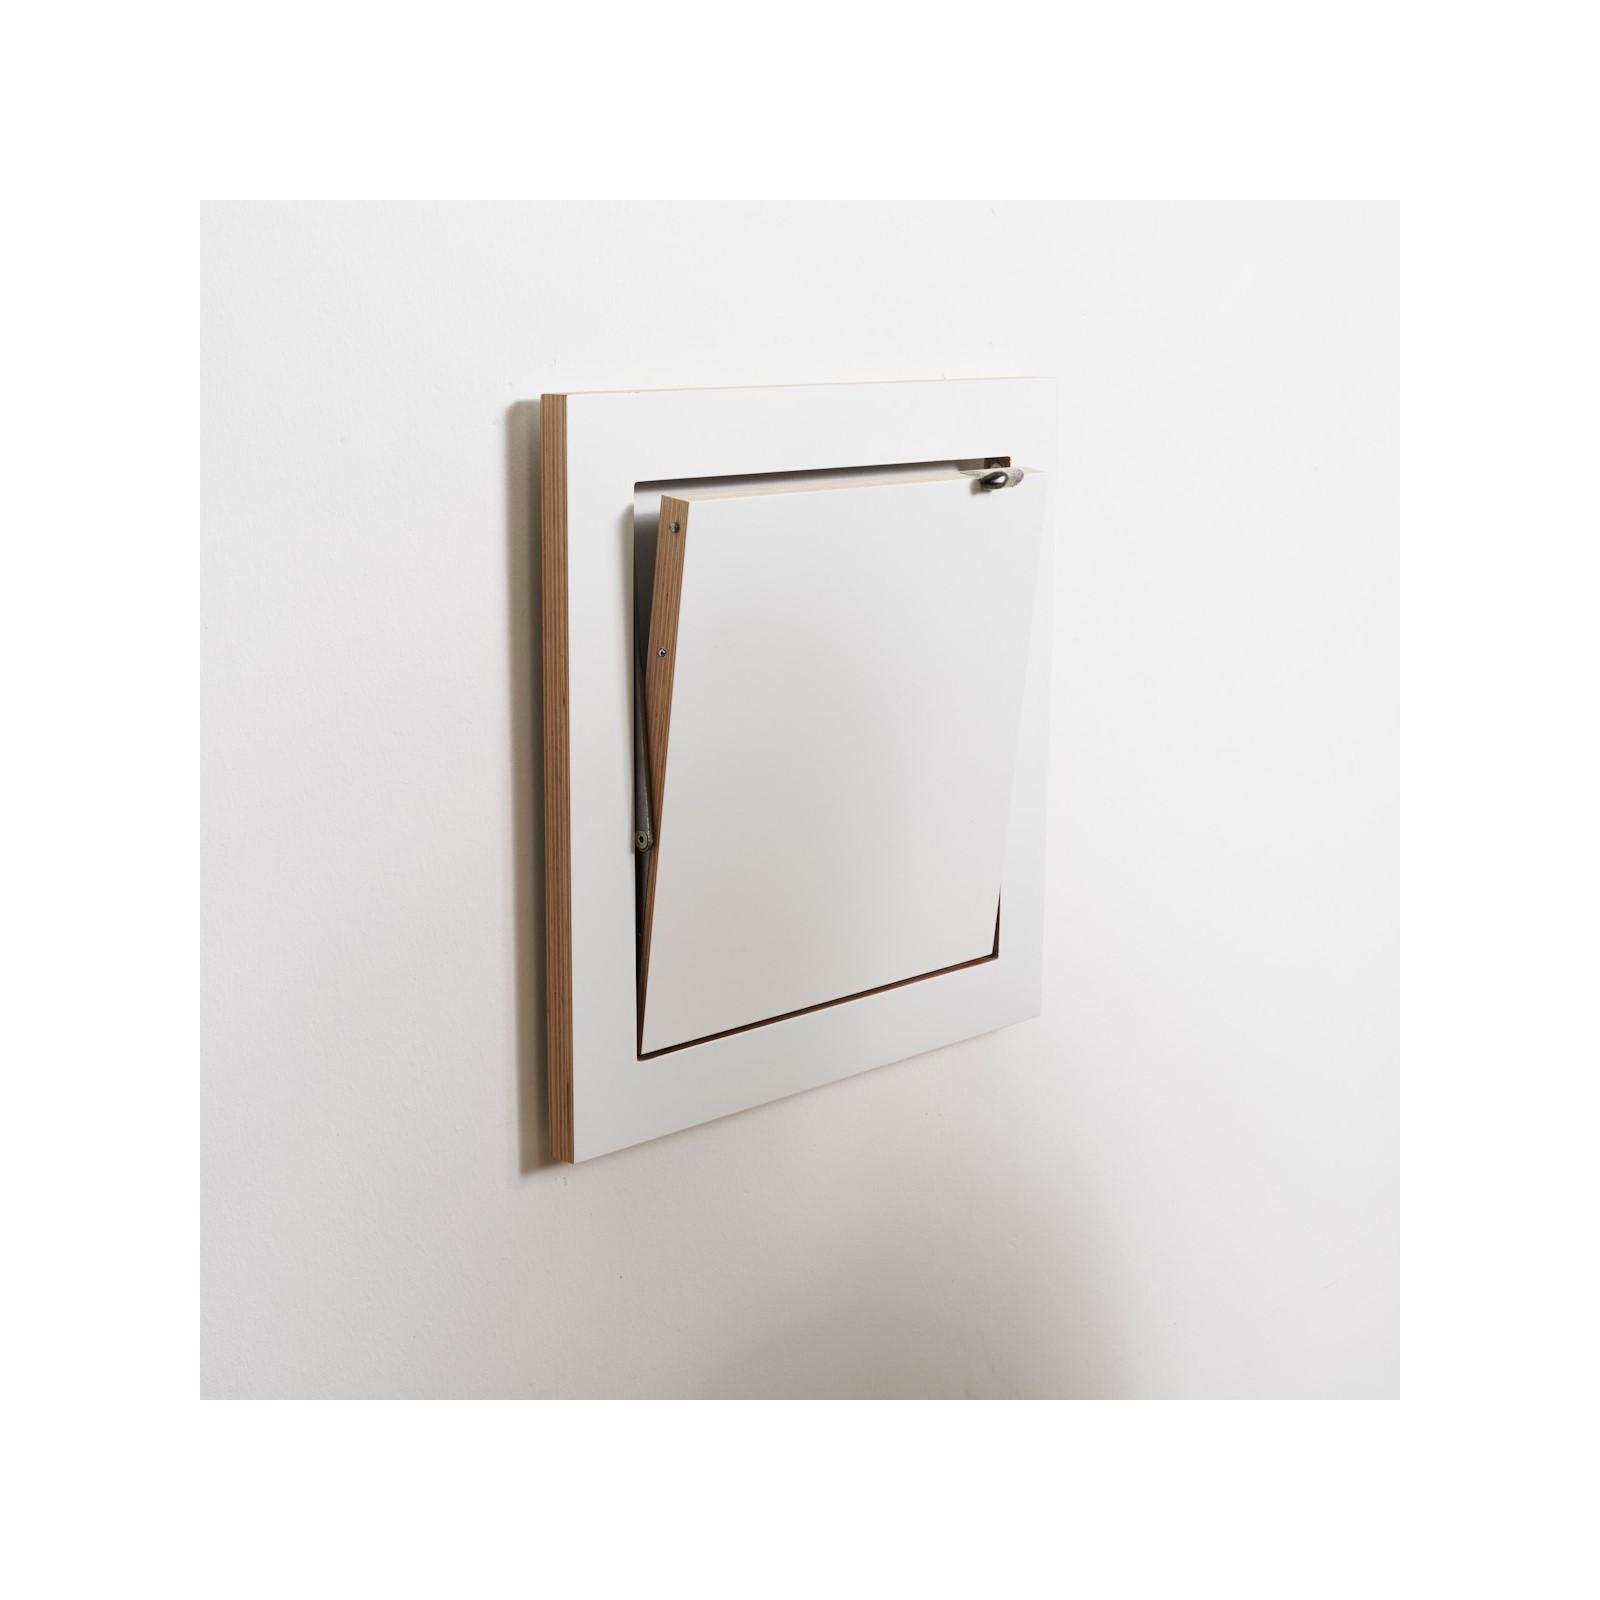 etag re carr e feuille blanche arne concept. Black Bedroom Furniture Sets. Home Design Ideas